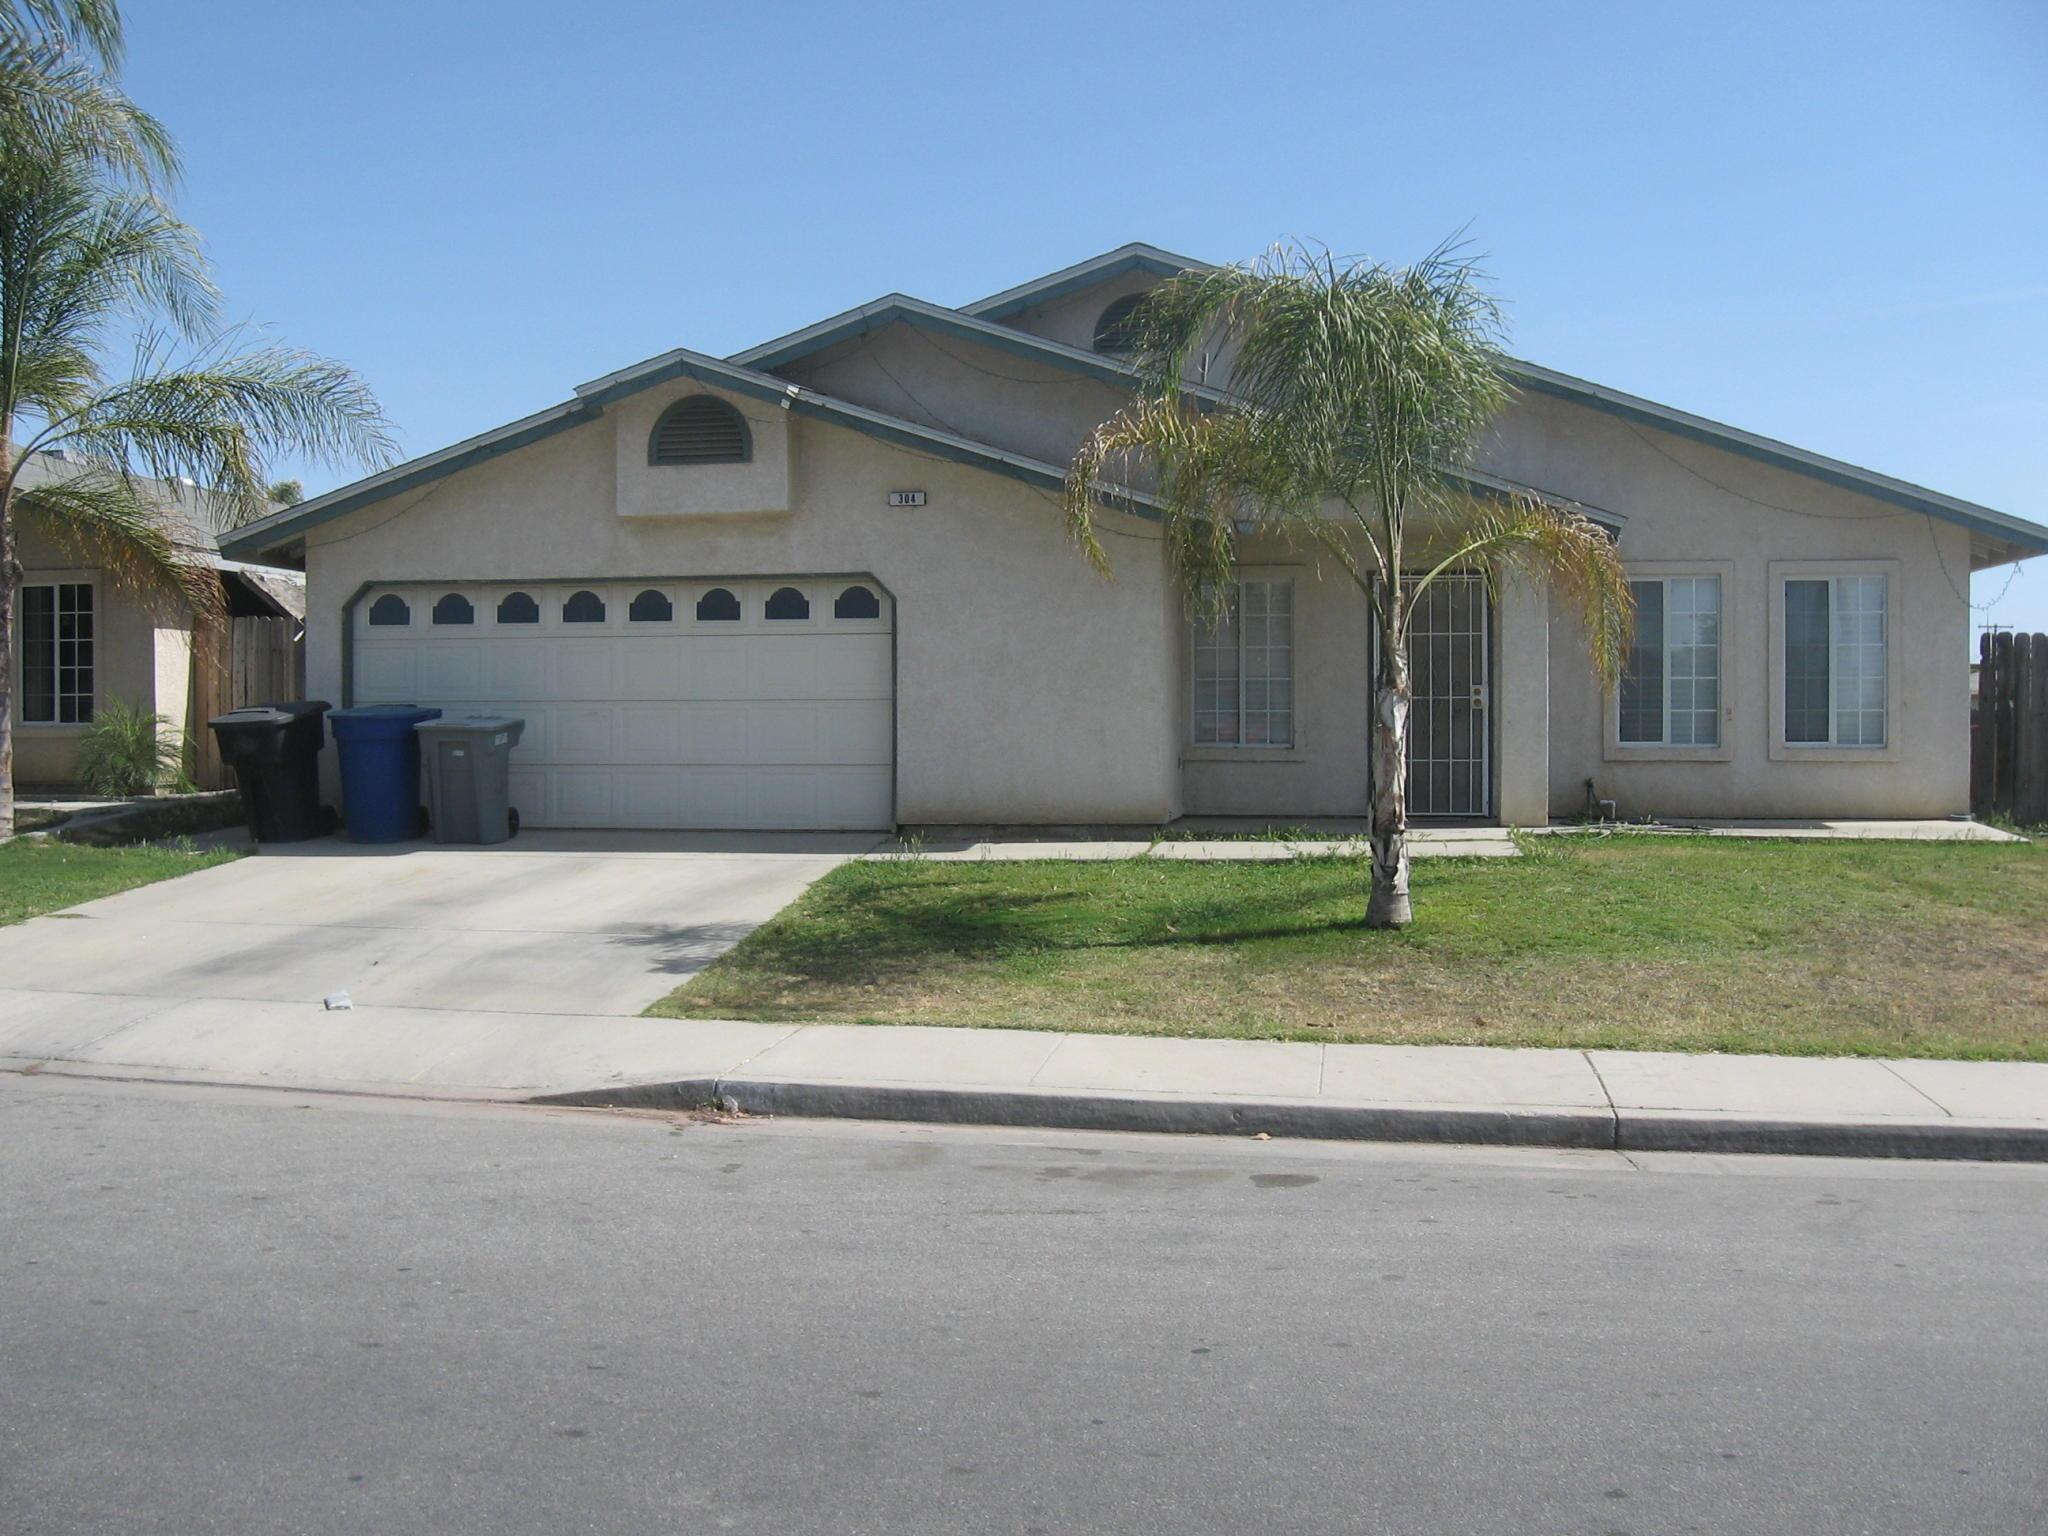 304 21st Ave Delano CA Estimate and Home Details